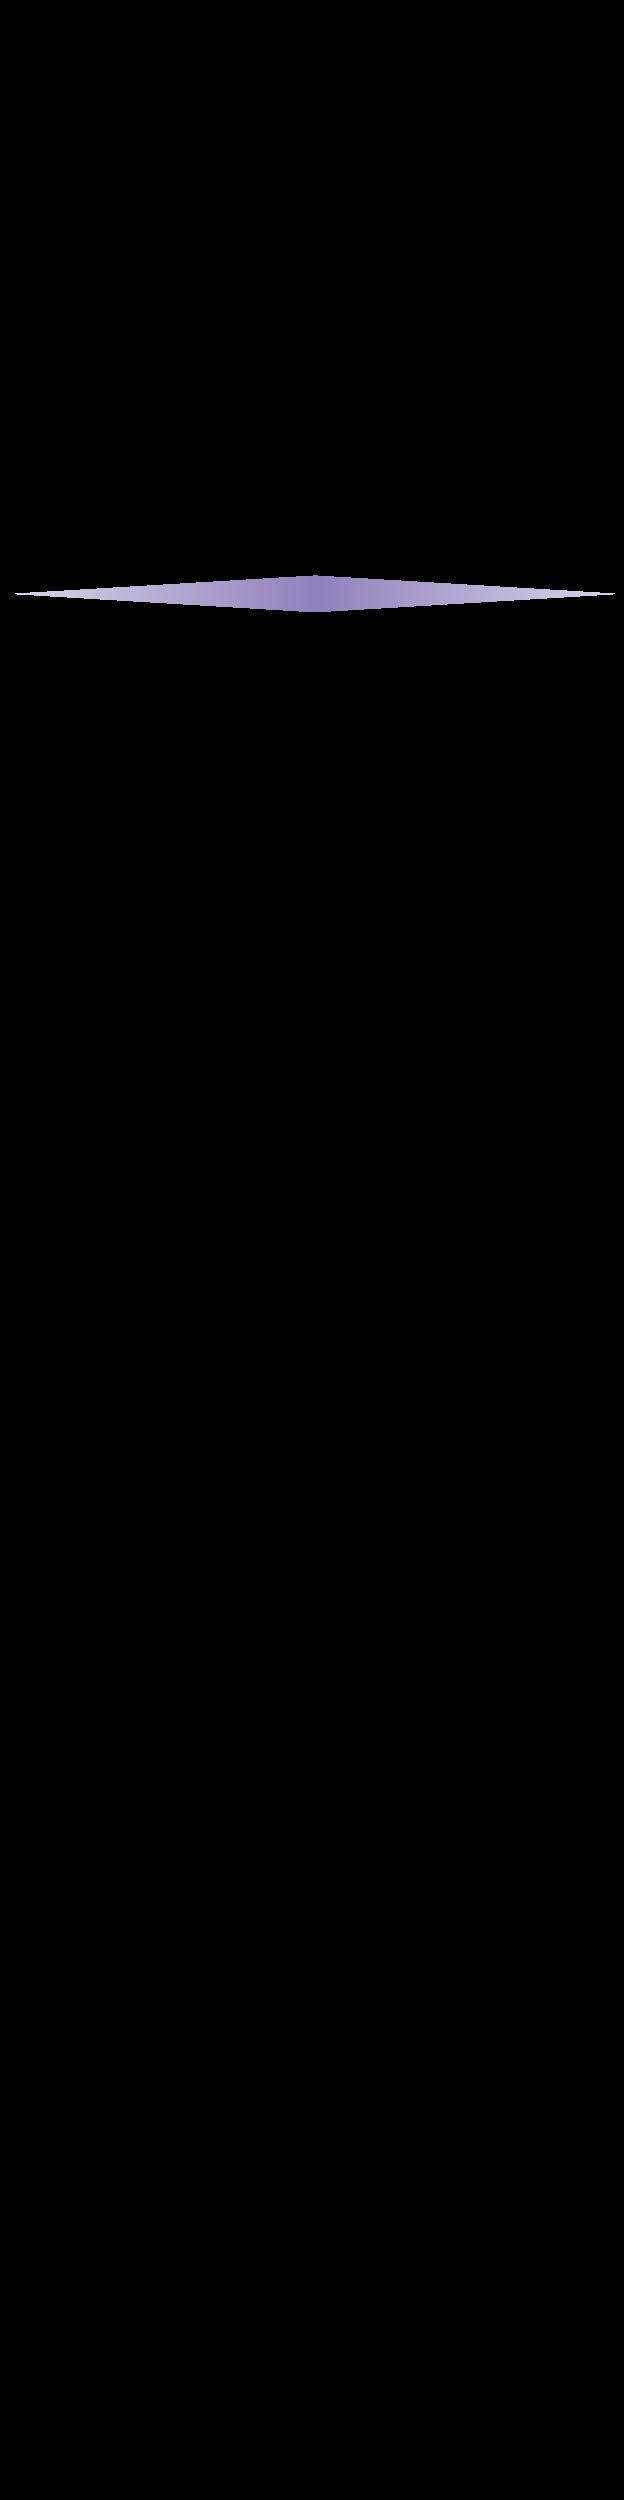 [Image: image?w=624&h=8&rev=49&ac=1]